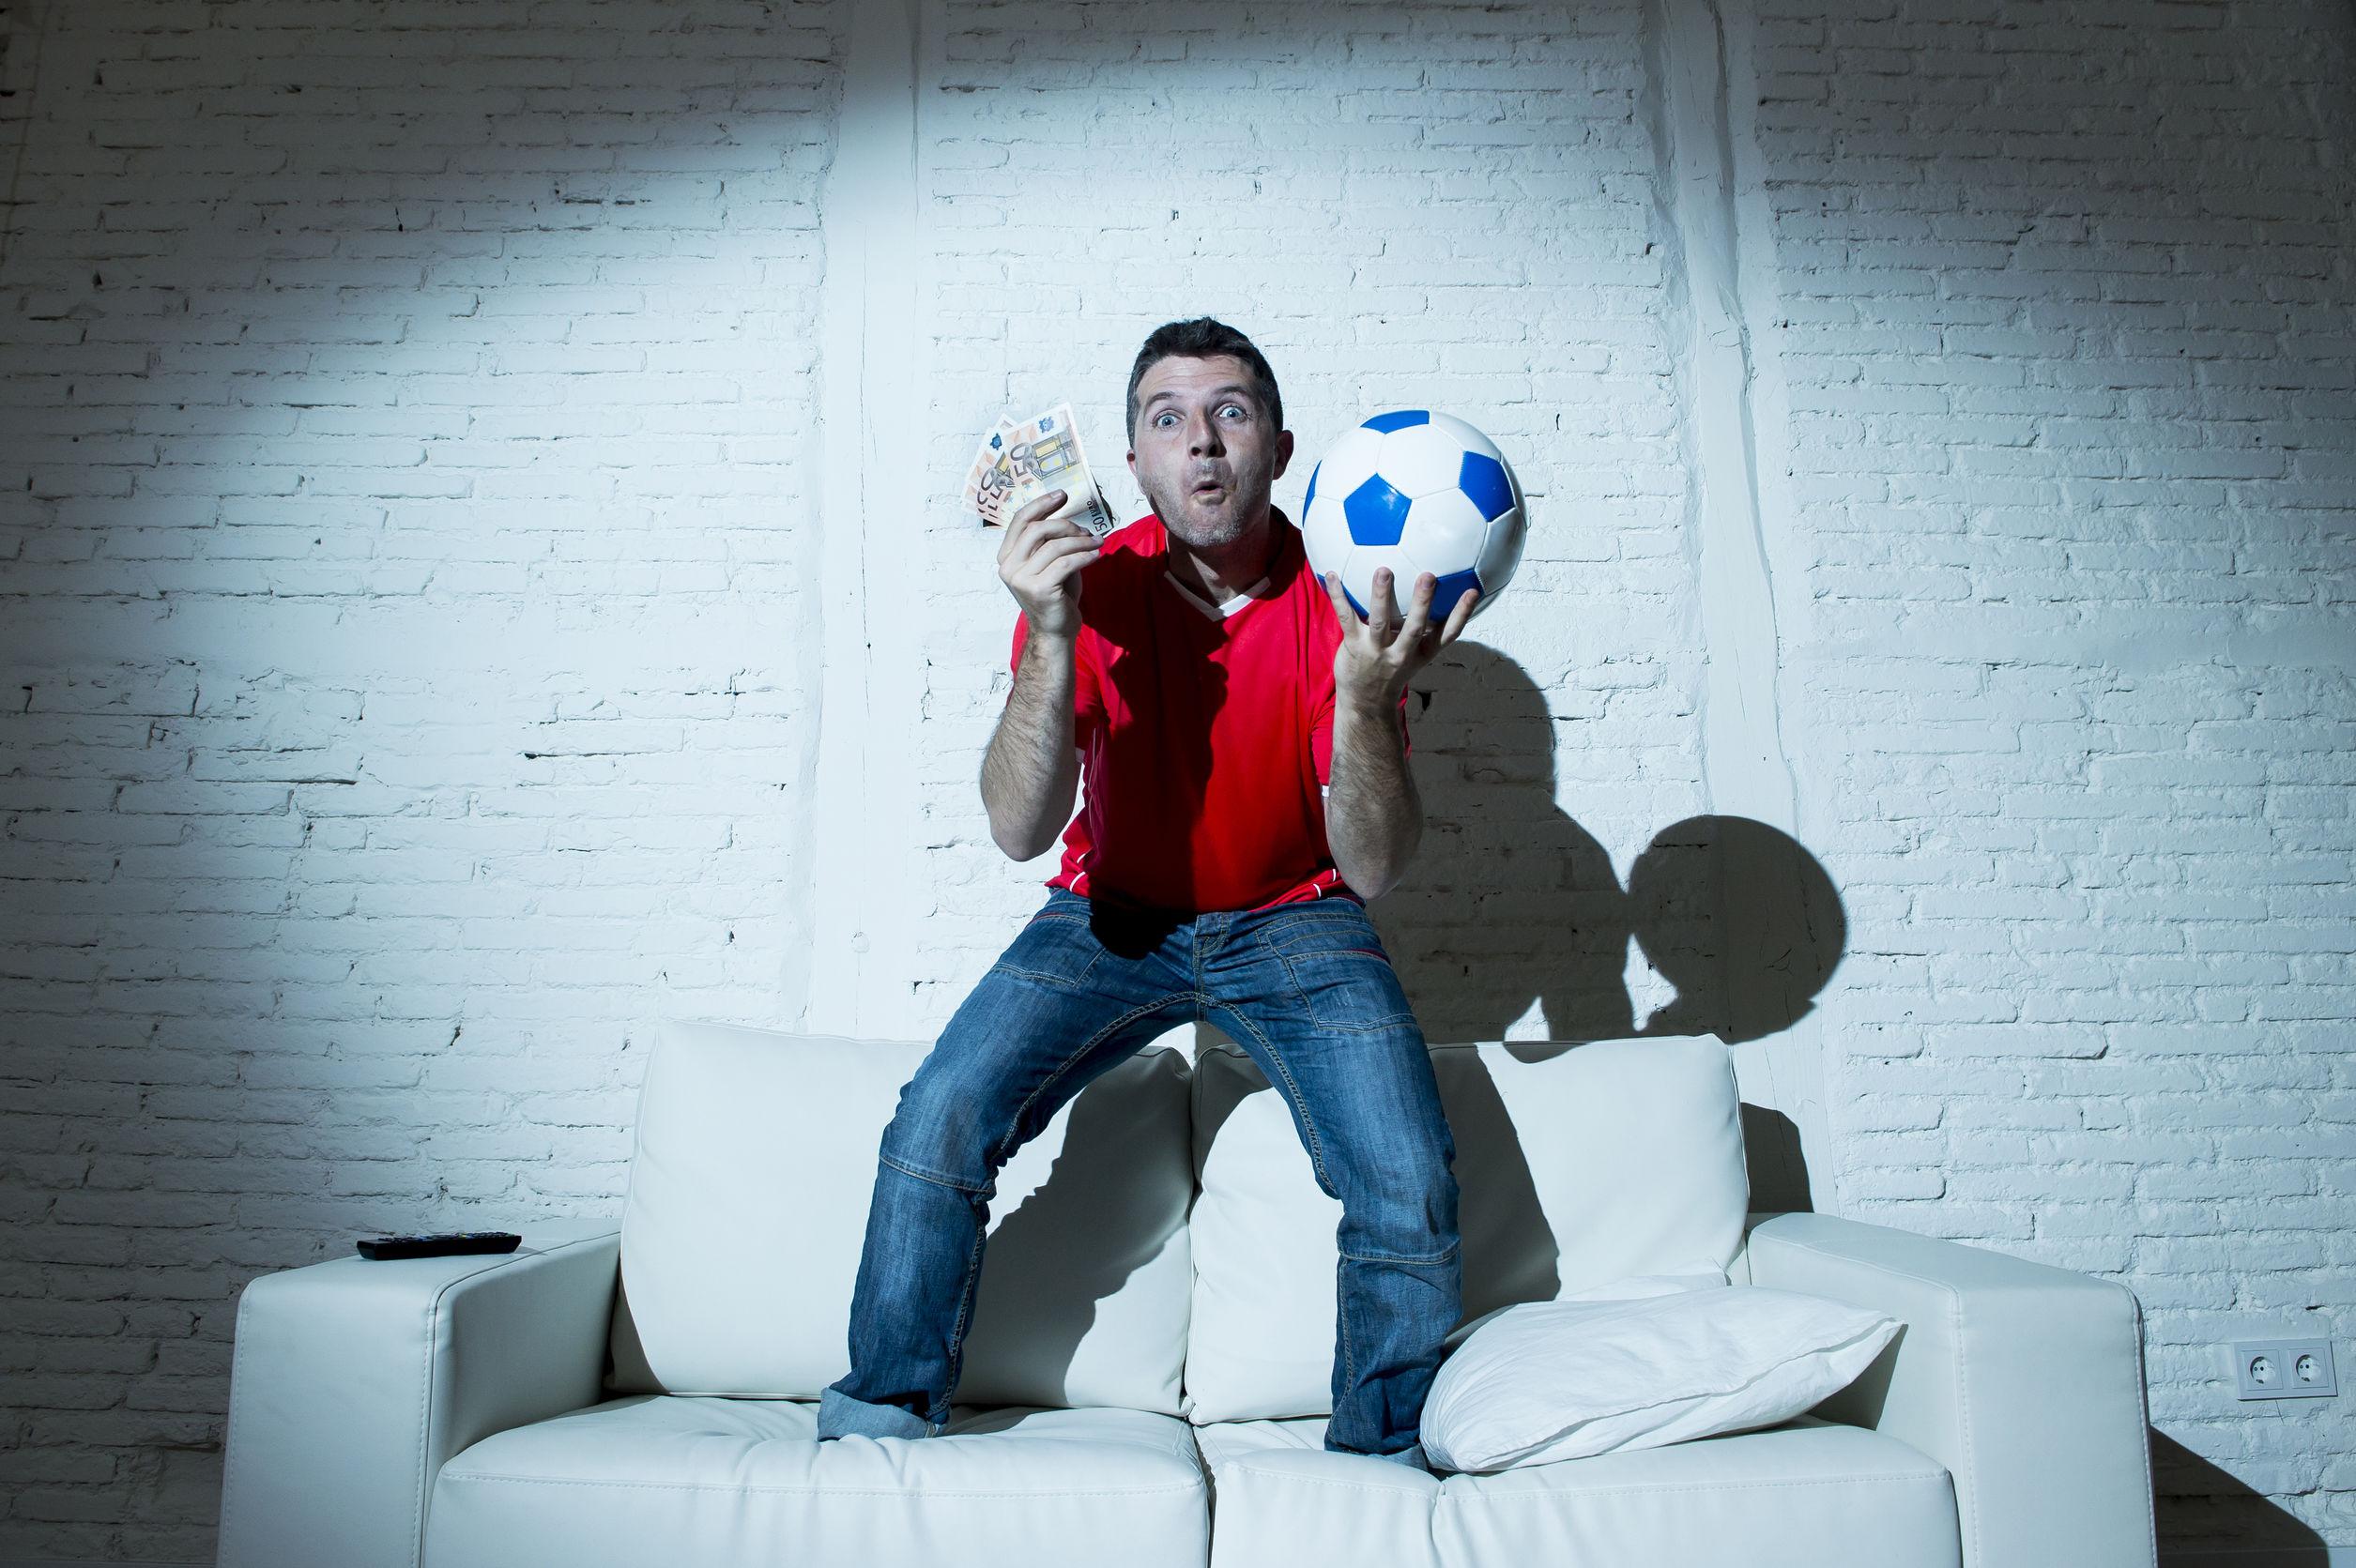 crazy man holding money and soccer ball watching football on tv internet online bet gambling